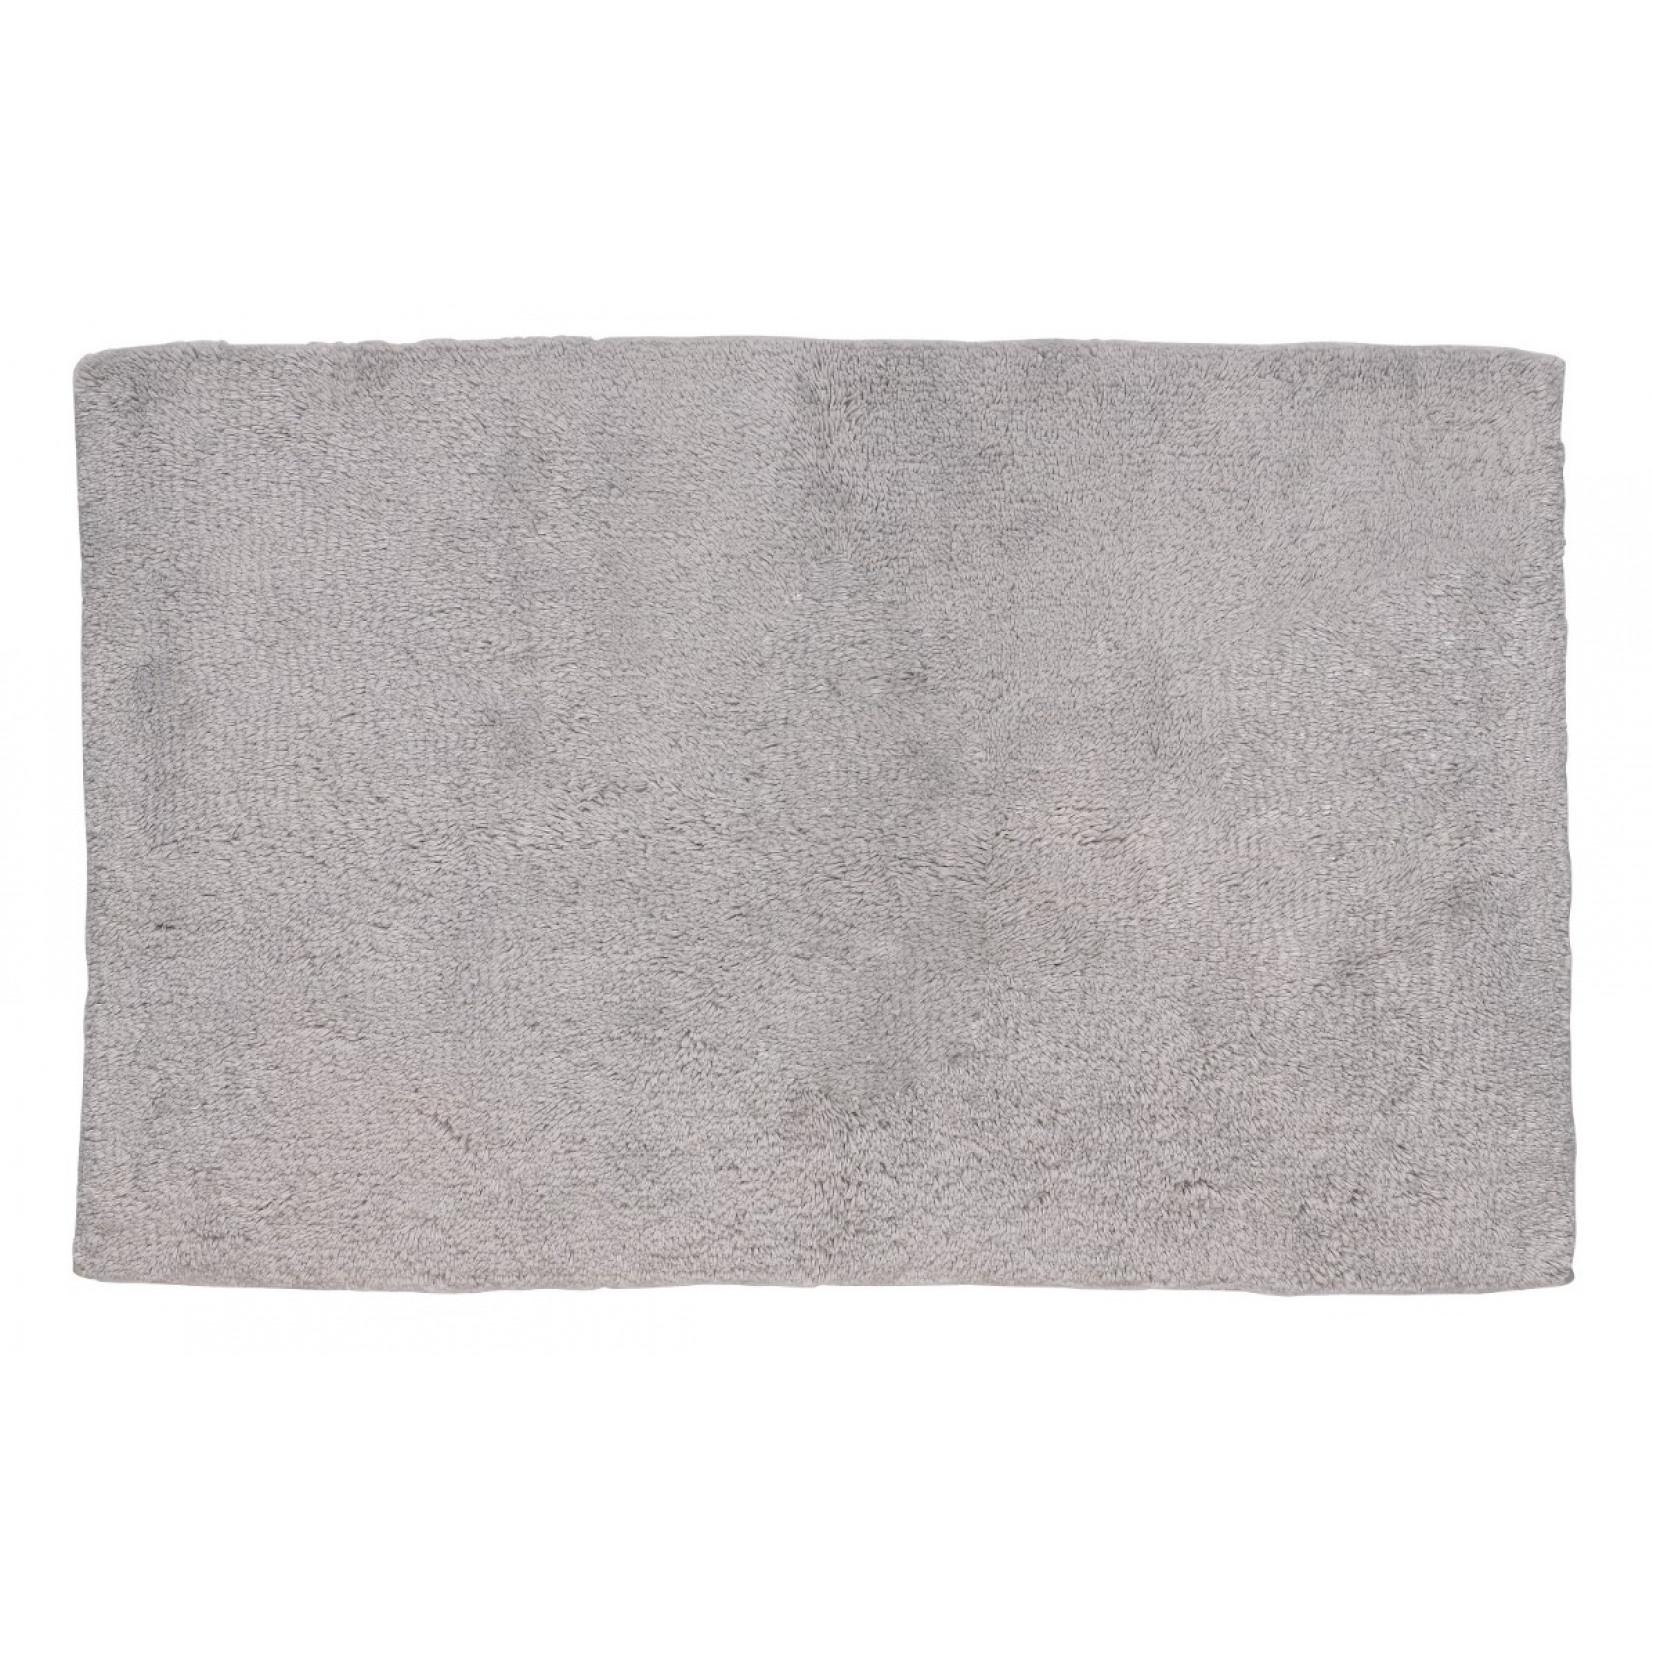 Tapis de Bain Ladessa Uni Gris Clair | 80 x 50 x 2 cm